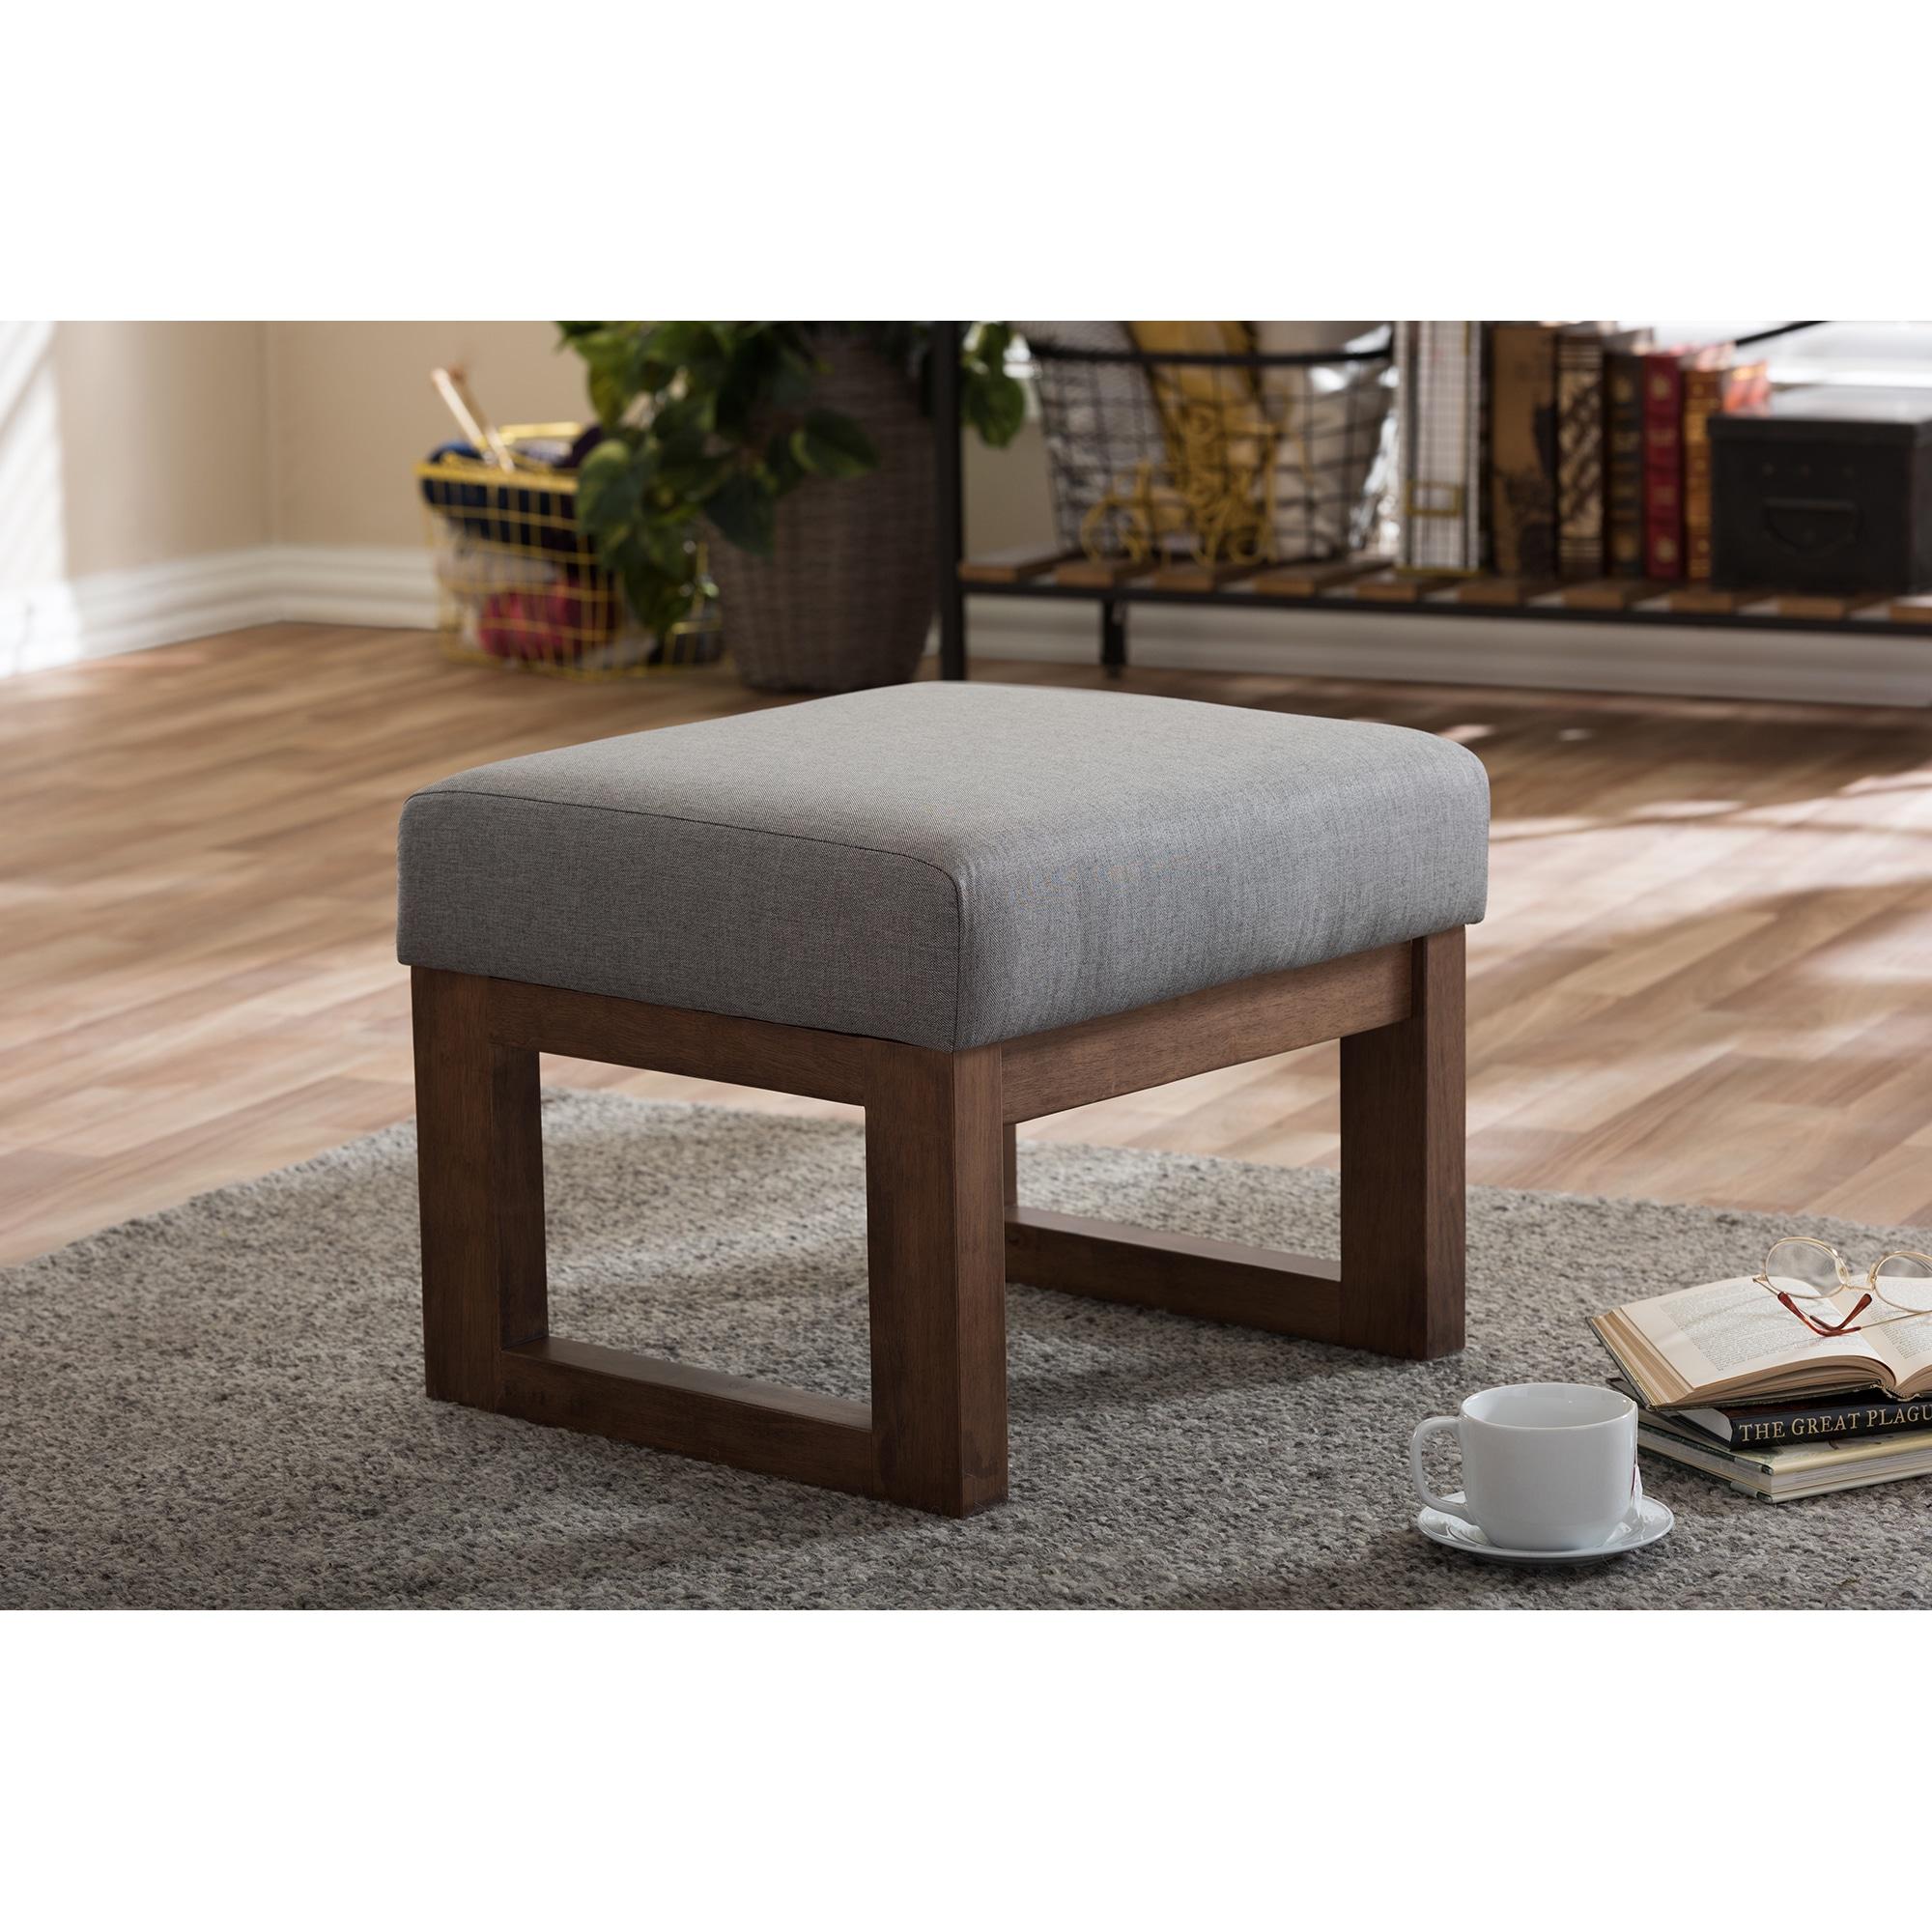 Strick U0026 Bolton Coleman Mid Century Modern Grey Upholstered Ottoman Stool